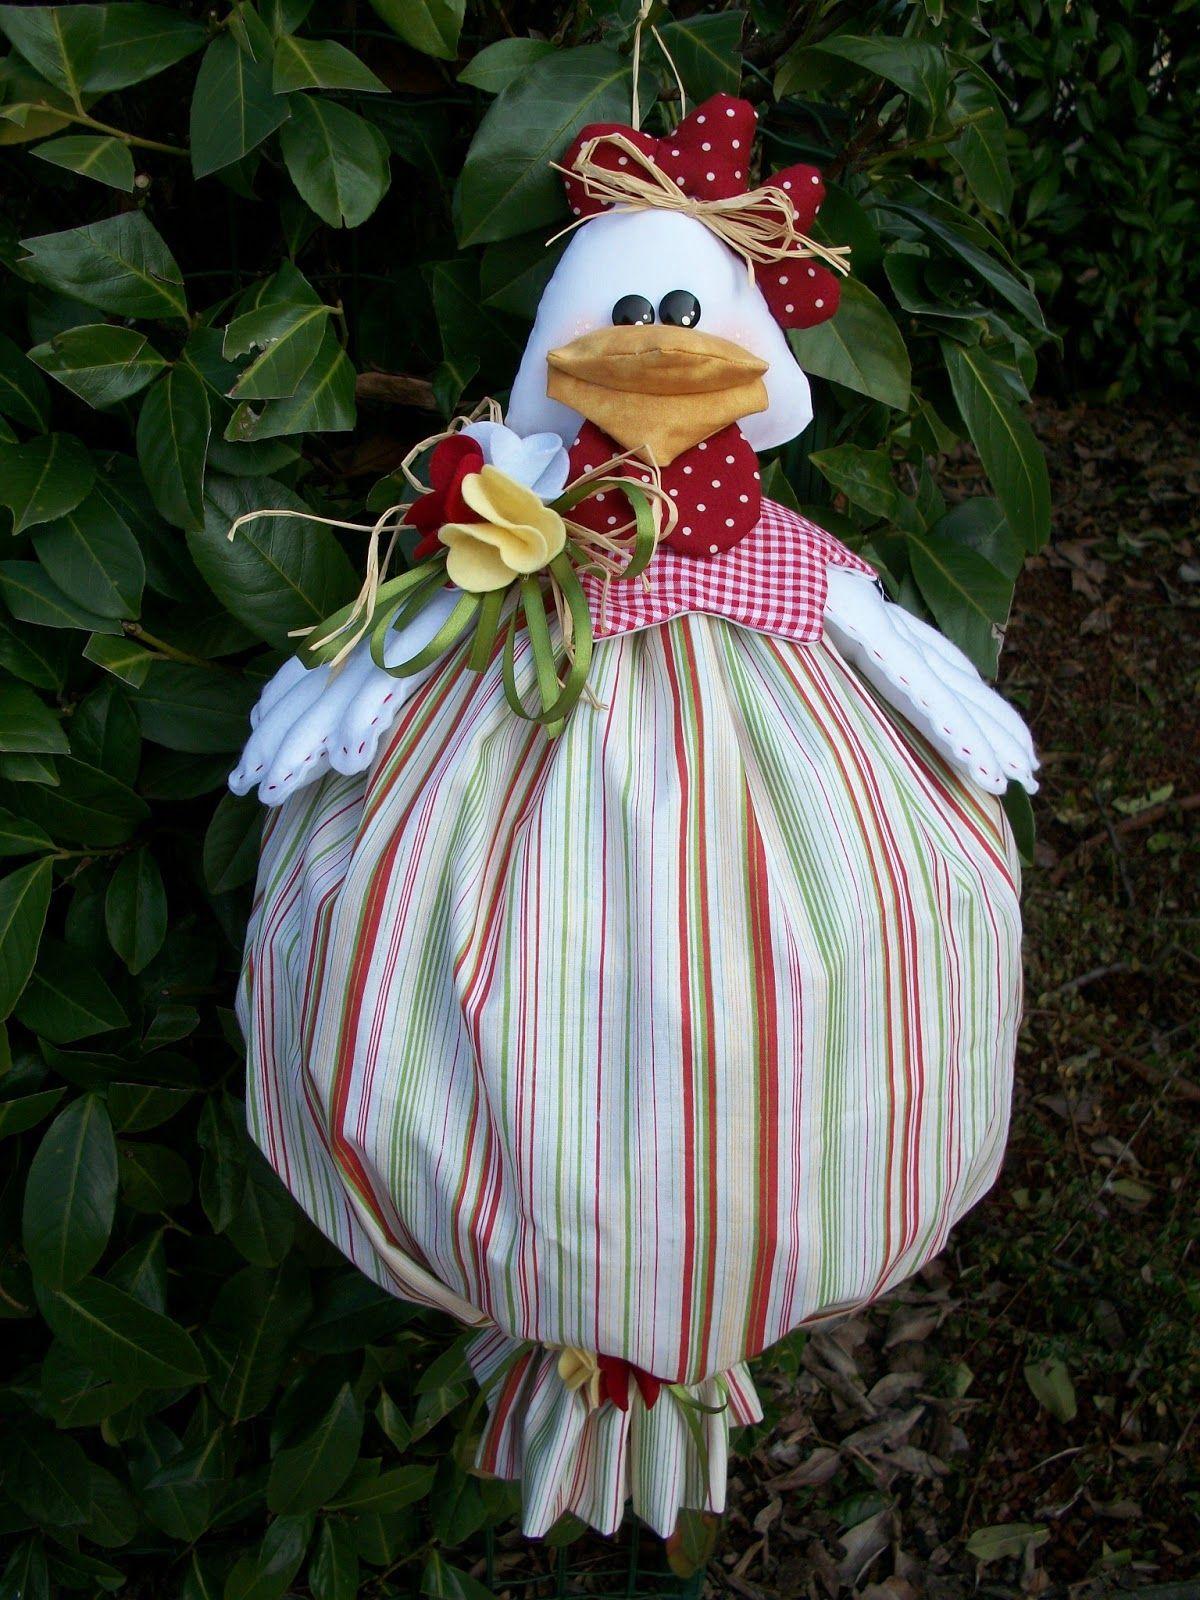 Cute Laundry Bags Adorable With ohcute laundry bag | Cocococoooooo | Pinterest Photos